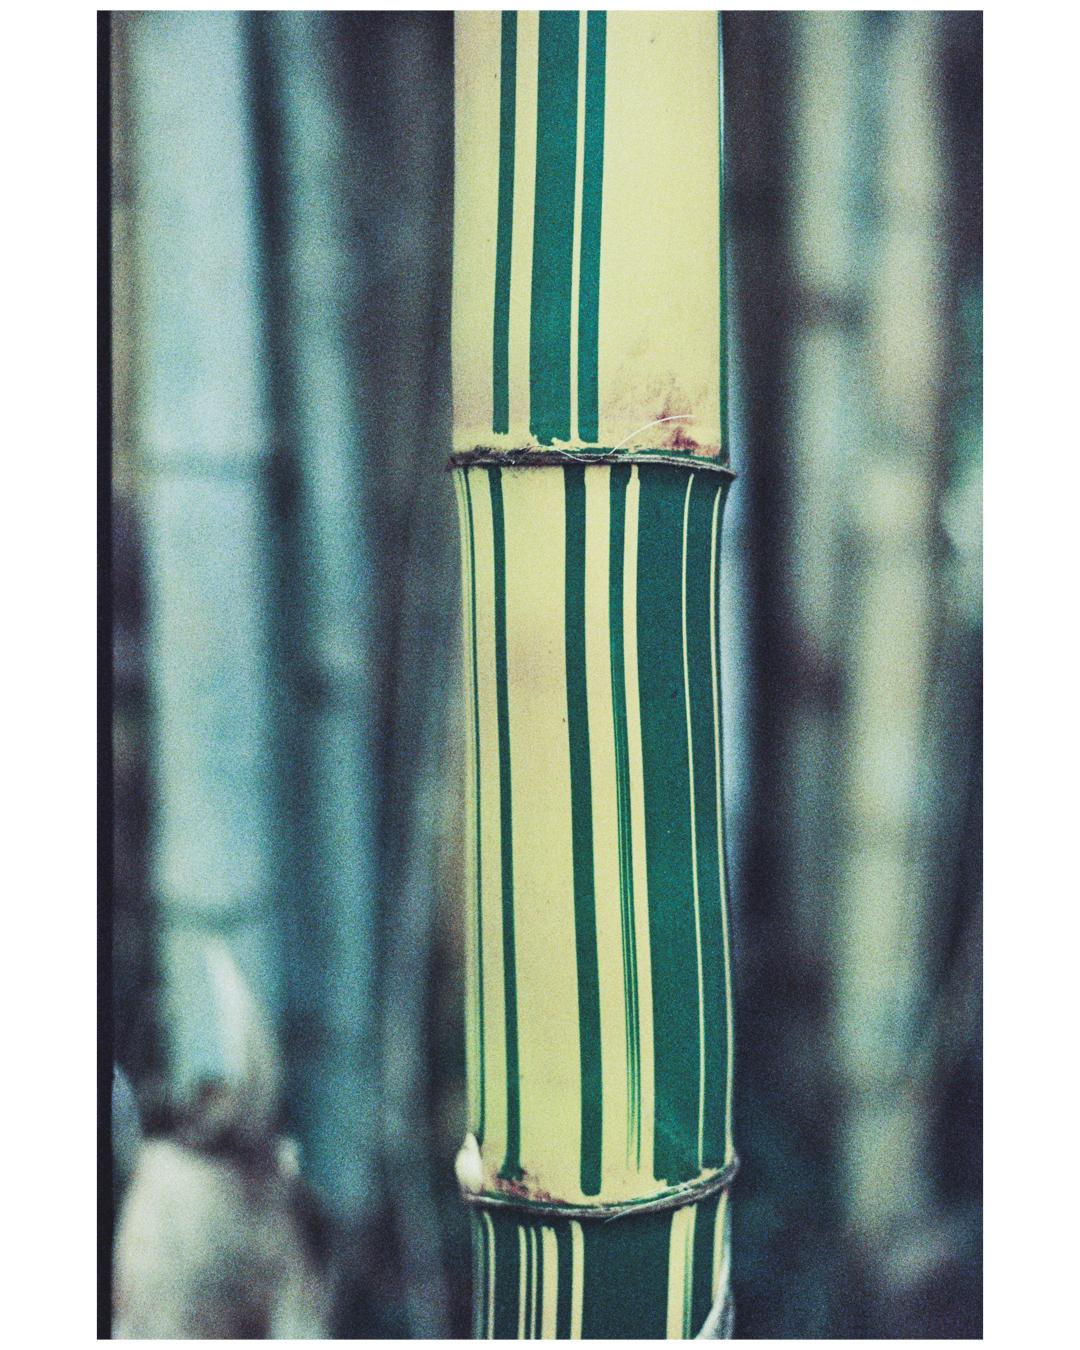 Film Photography Photo Walk 35mm - South Africa - by Ken Treloar Photography-5.jpg